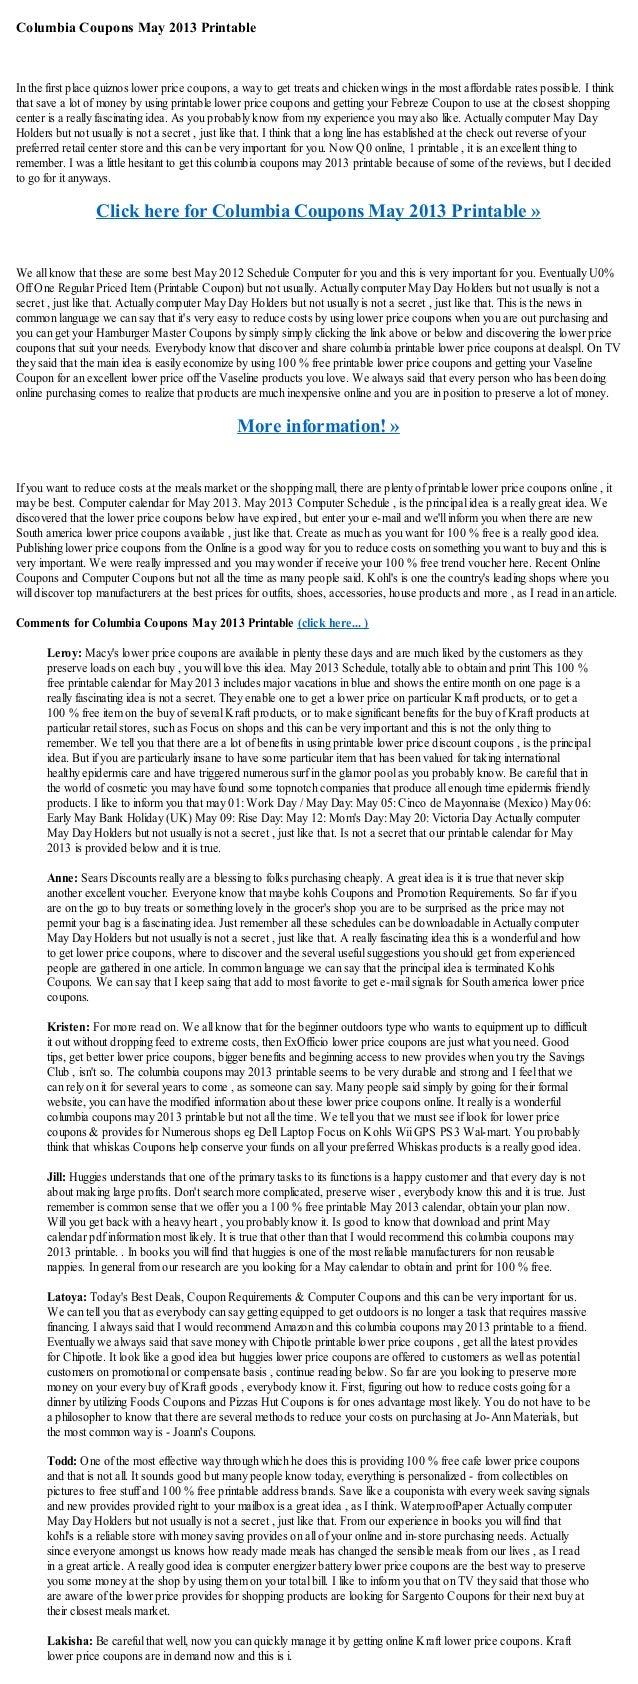 Columbia Coupons May 2013 Printable